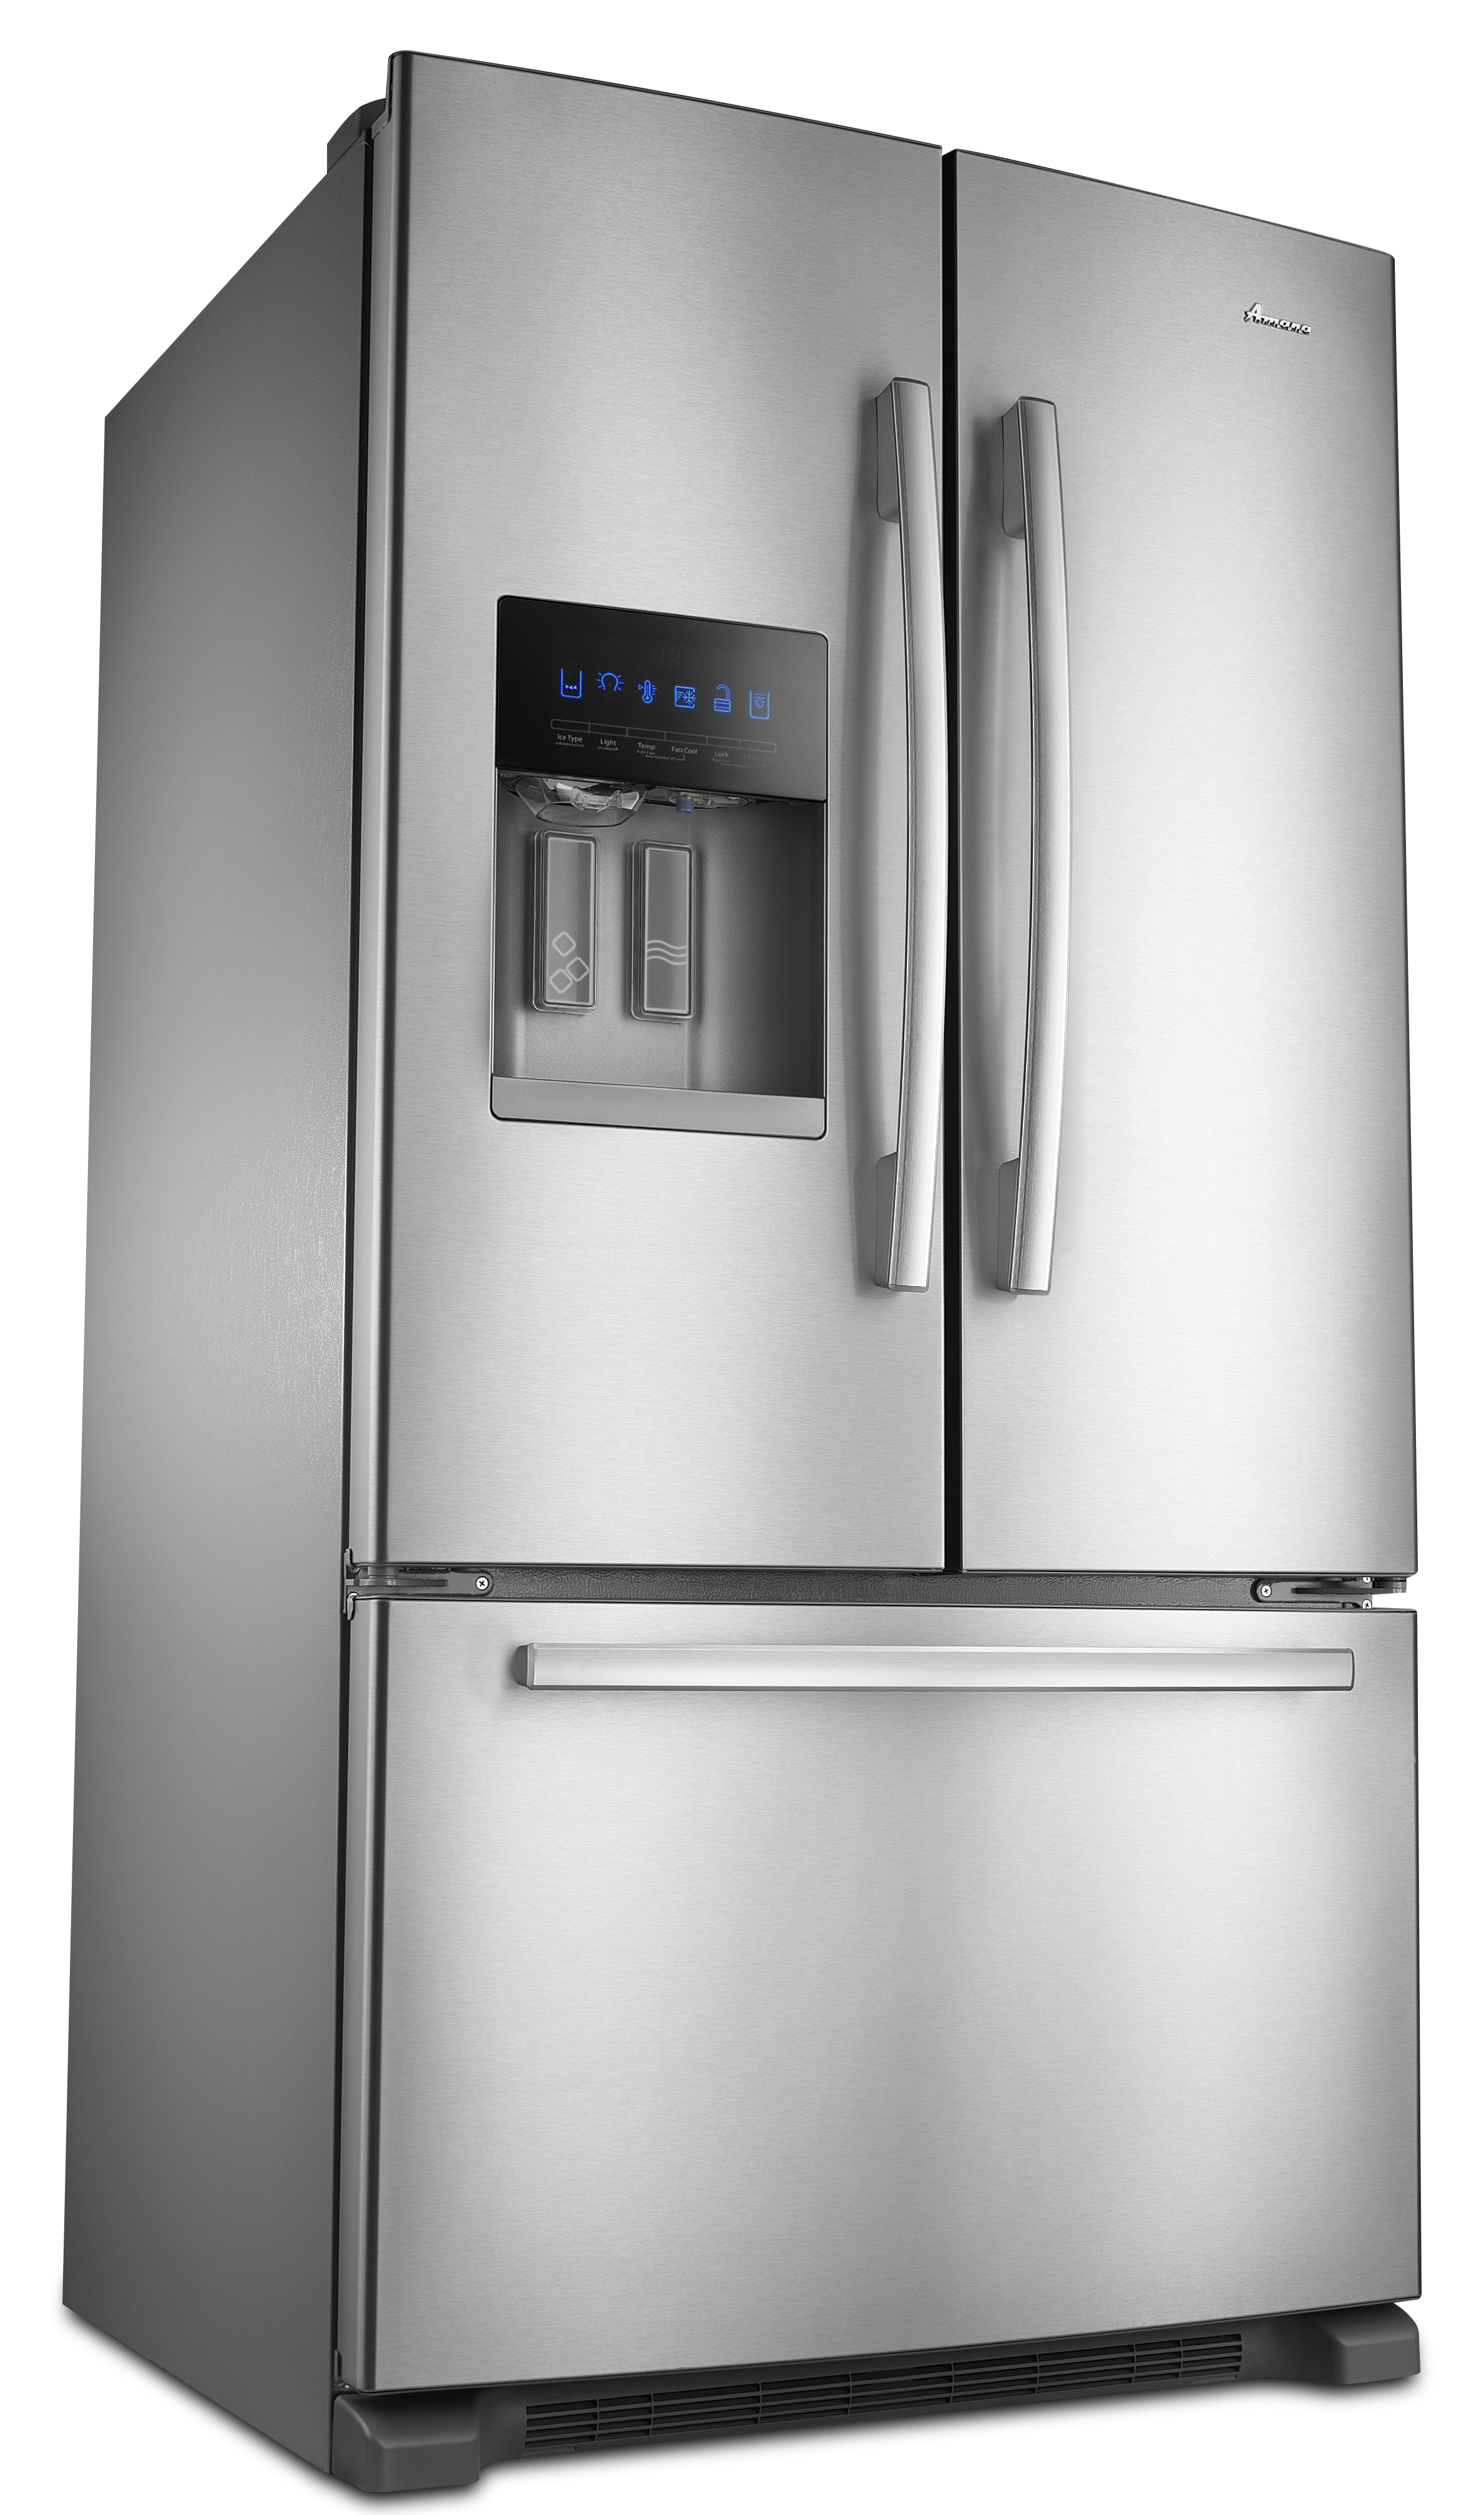 Ft. French Door Bottom Freezer Refrigerator Monochromatic Stainless Steel